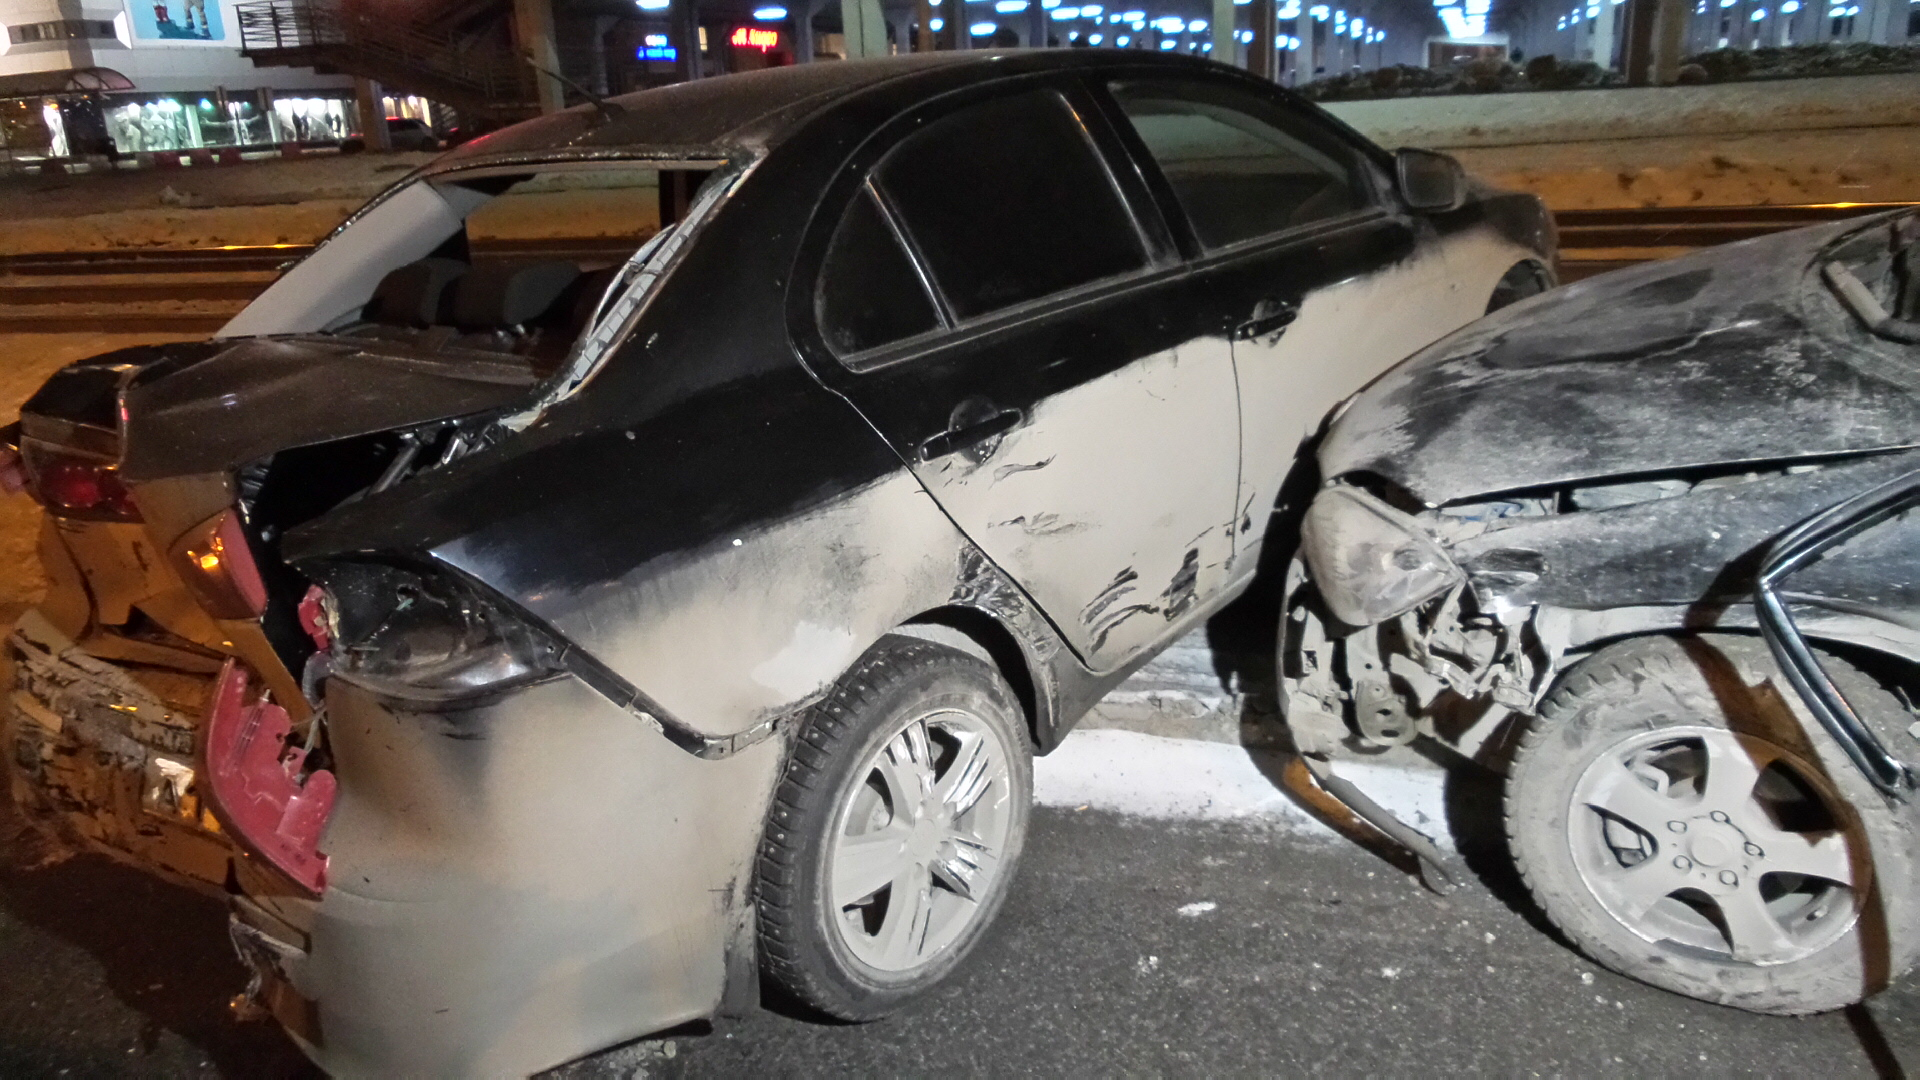 Возле «Карнавала» водитель на Nissan протаранил Mitsubishi и ушел с места ДТП